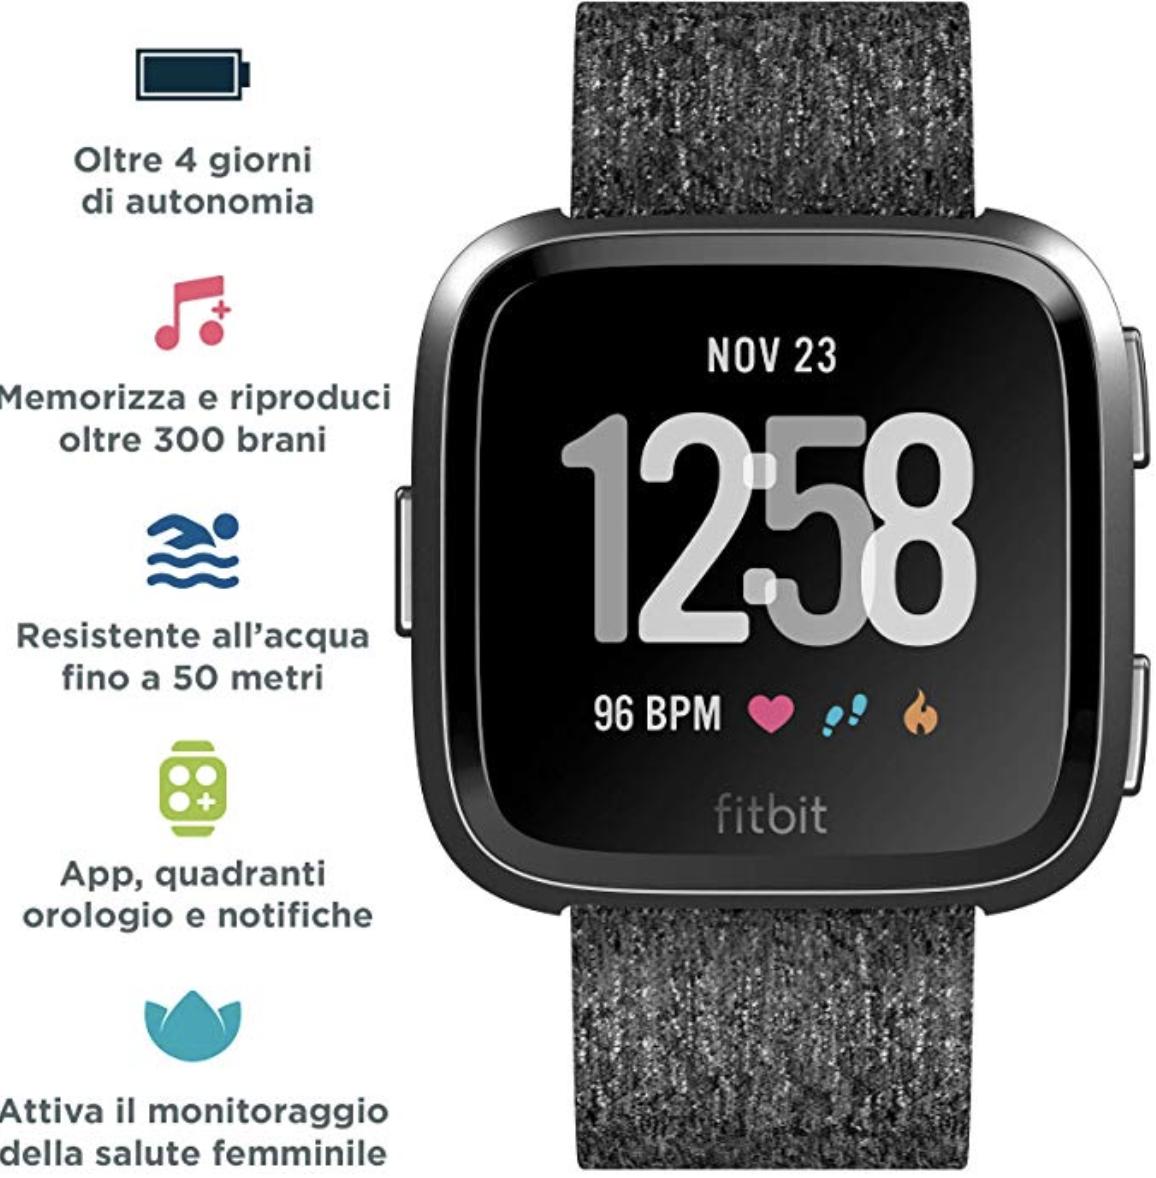 b6a550ce4ee455f22657b049f048e176 - How To Get Free Music On Fitbit Versa 2